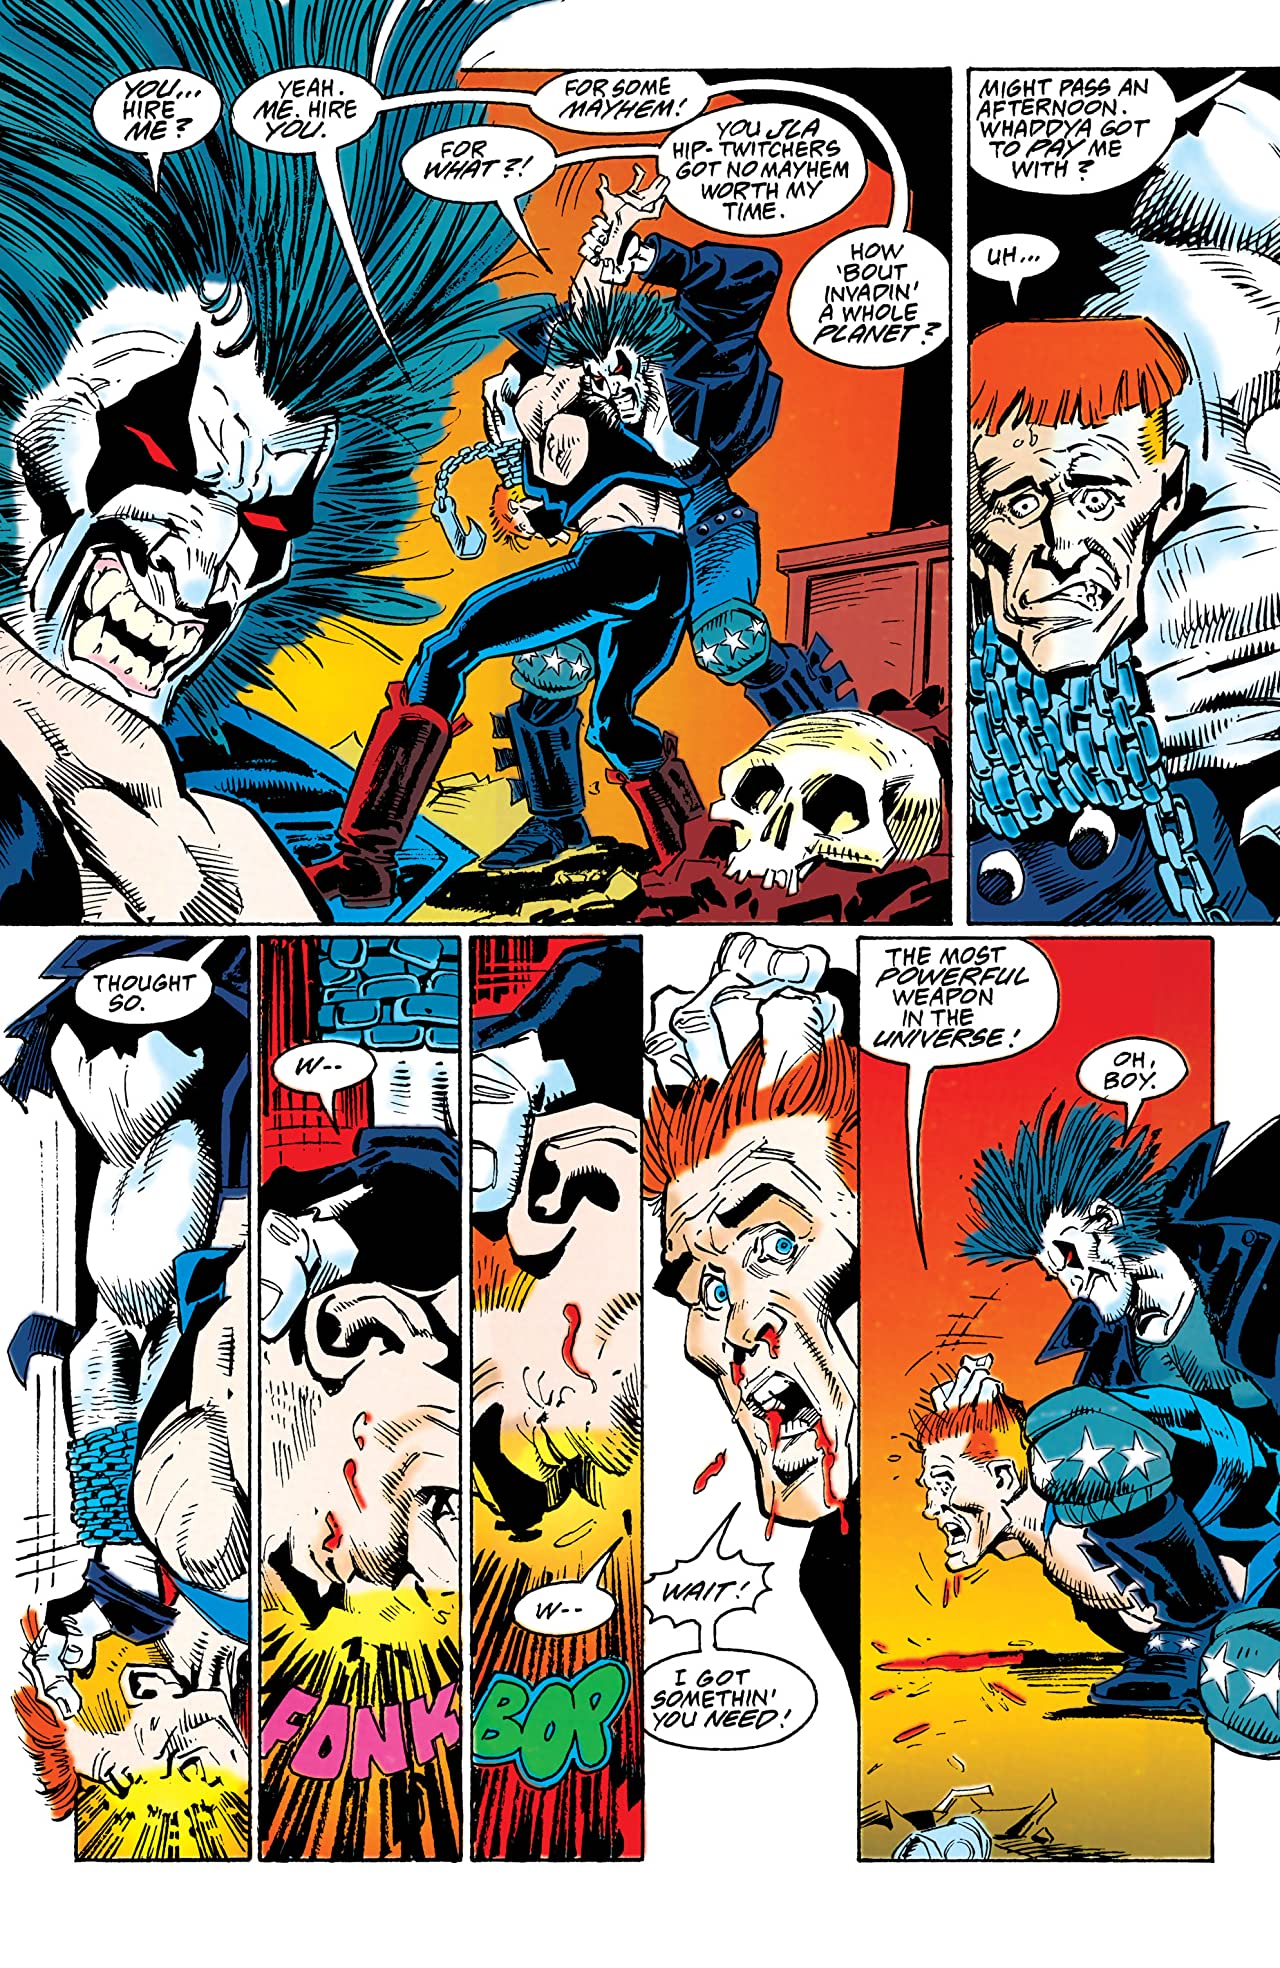 Guy Gardner: Reborn (1992) #2